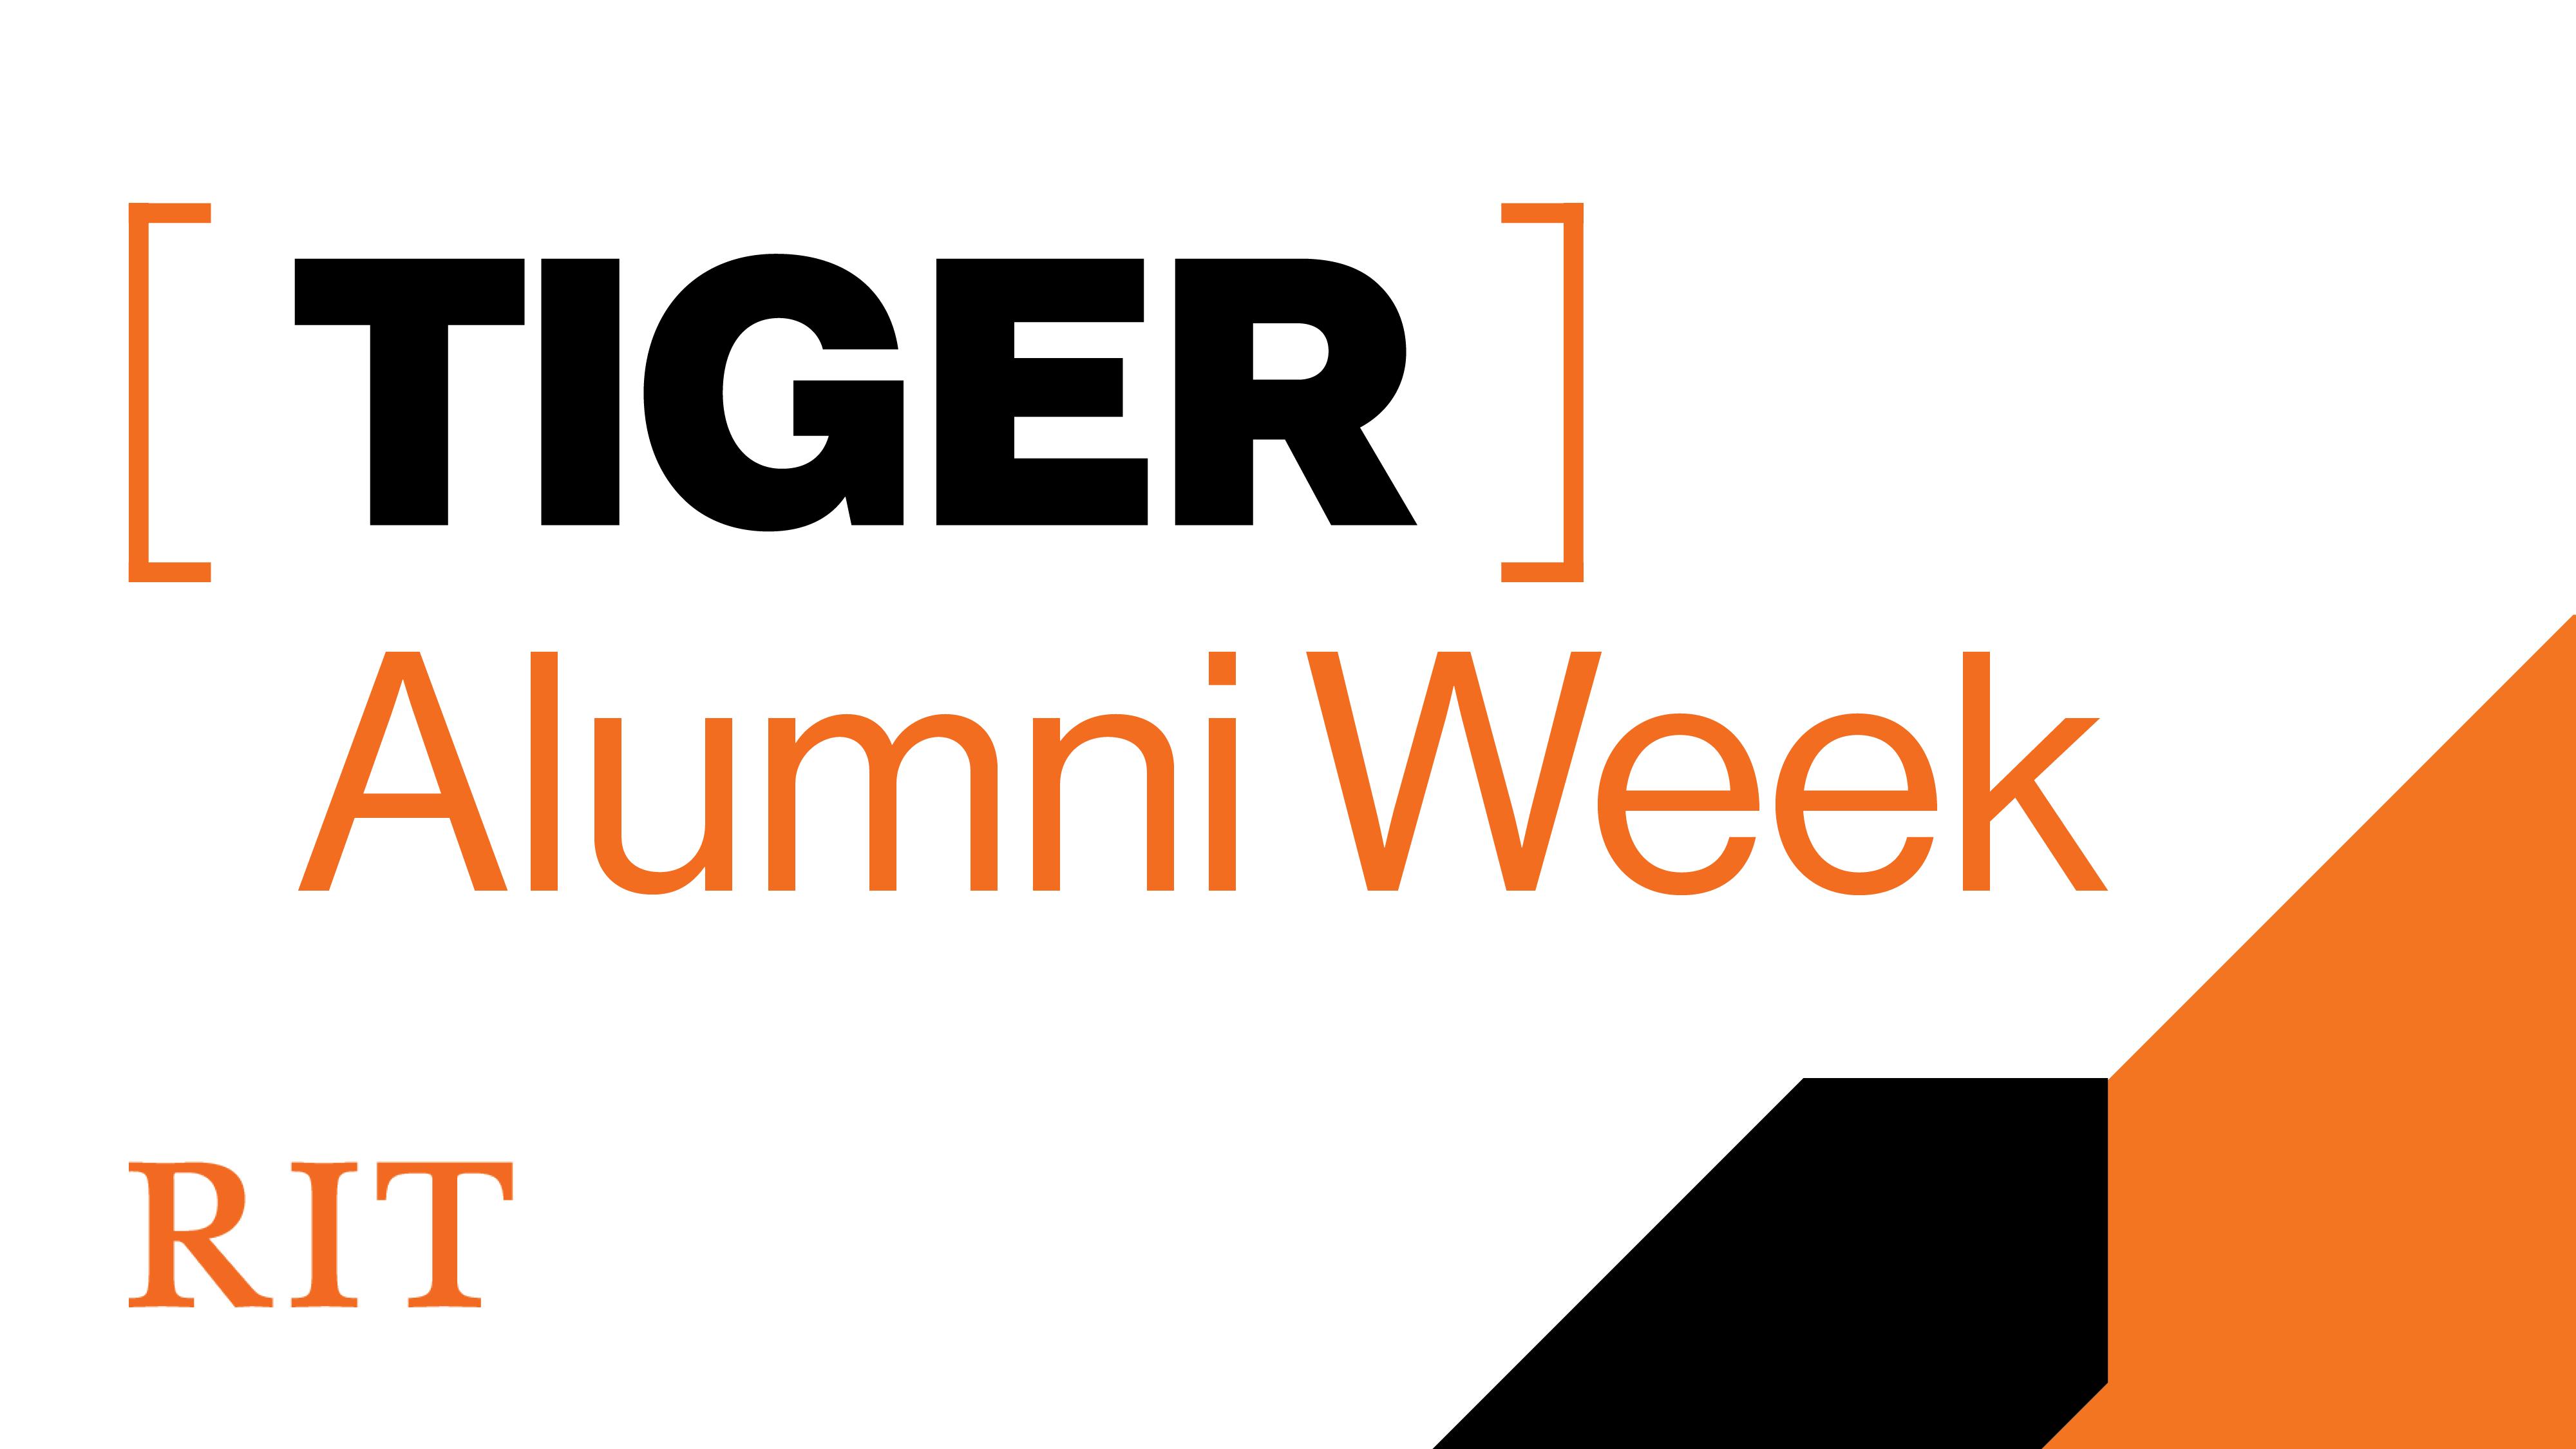 Tiger Alumni Week Graphic